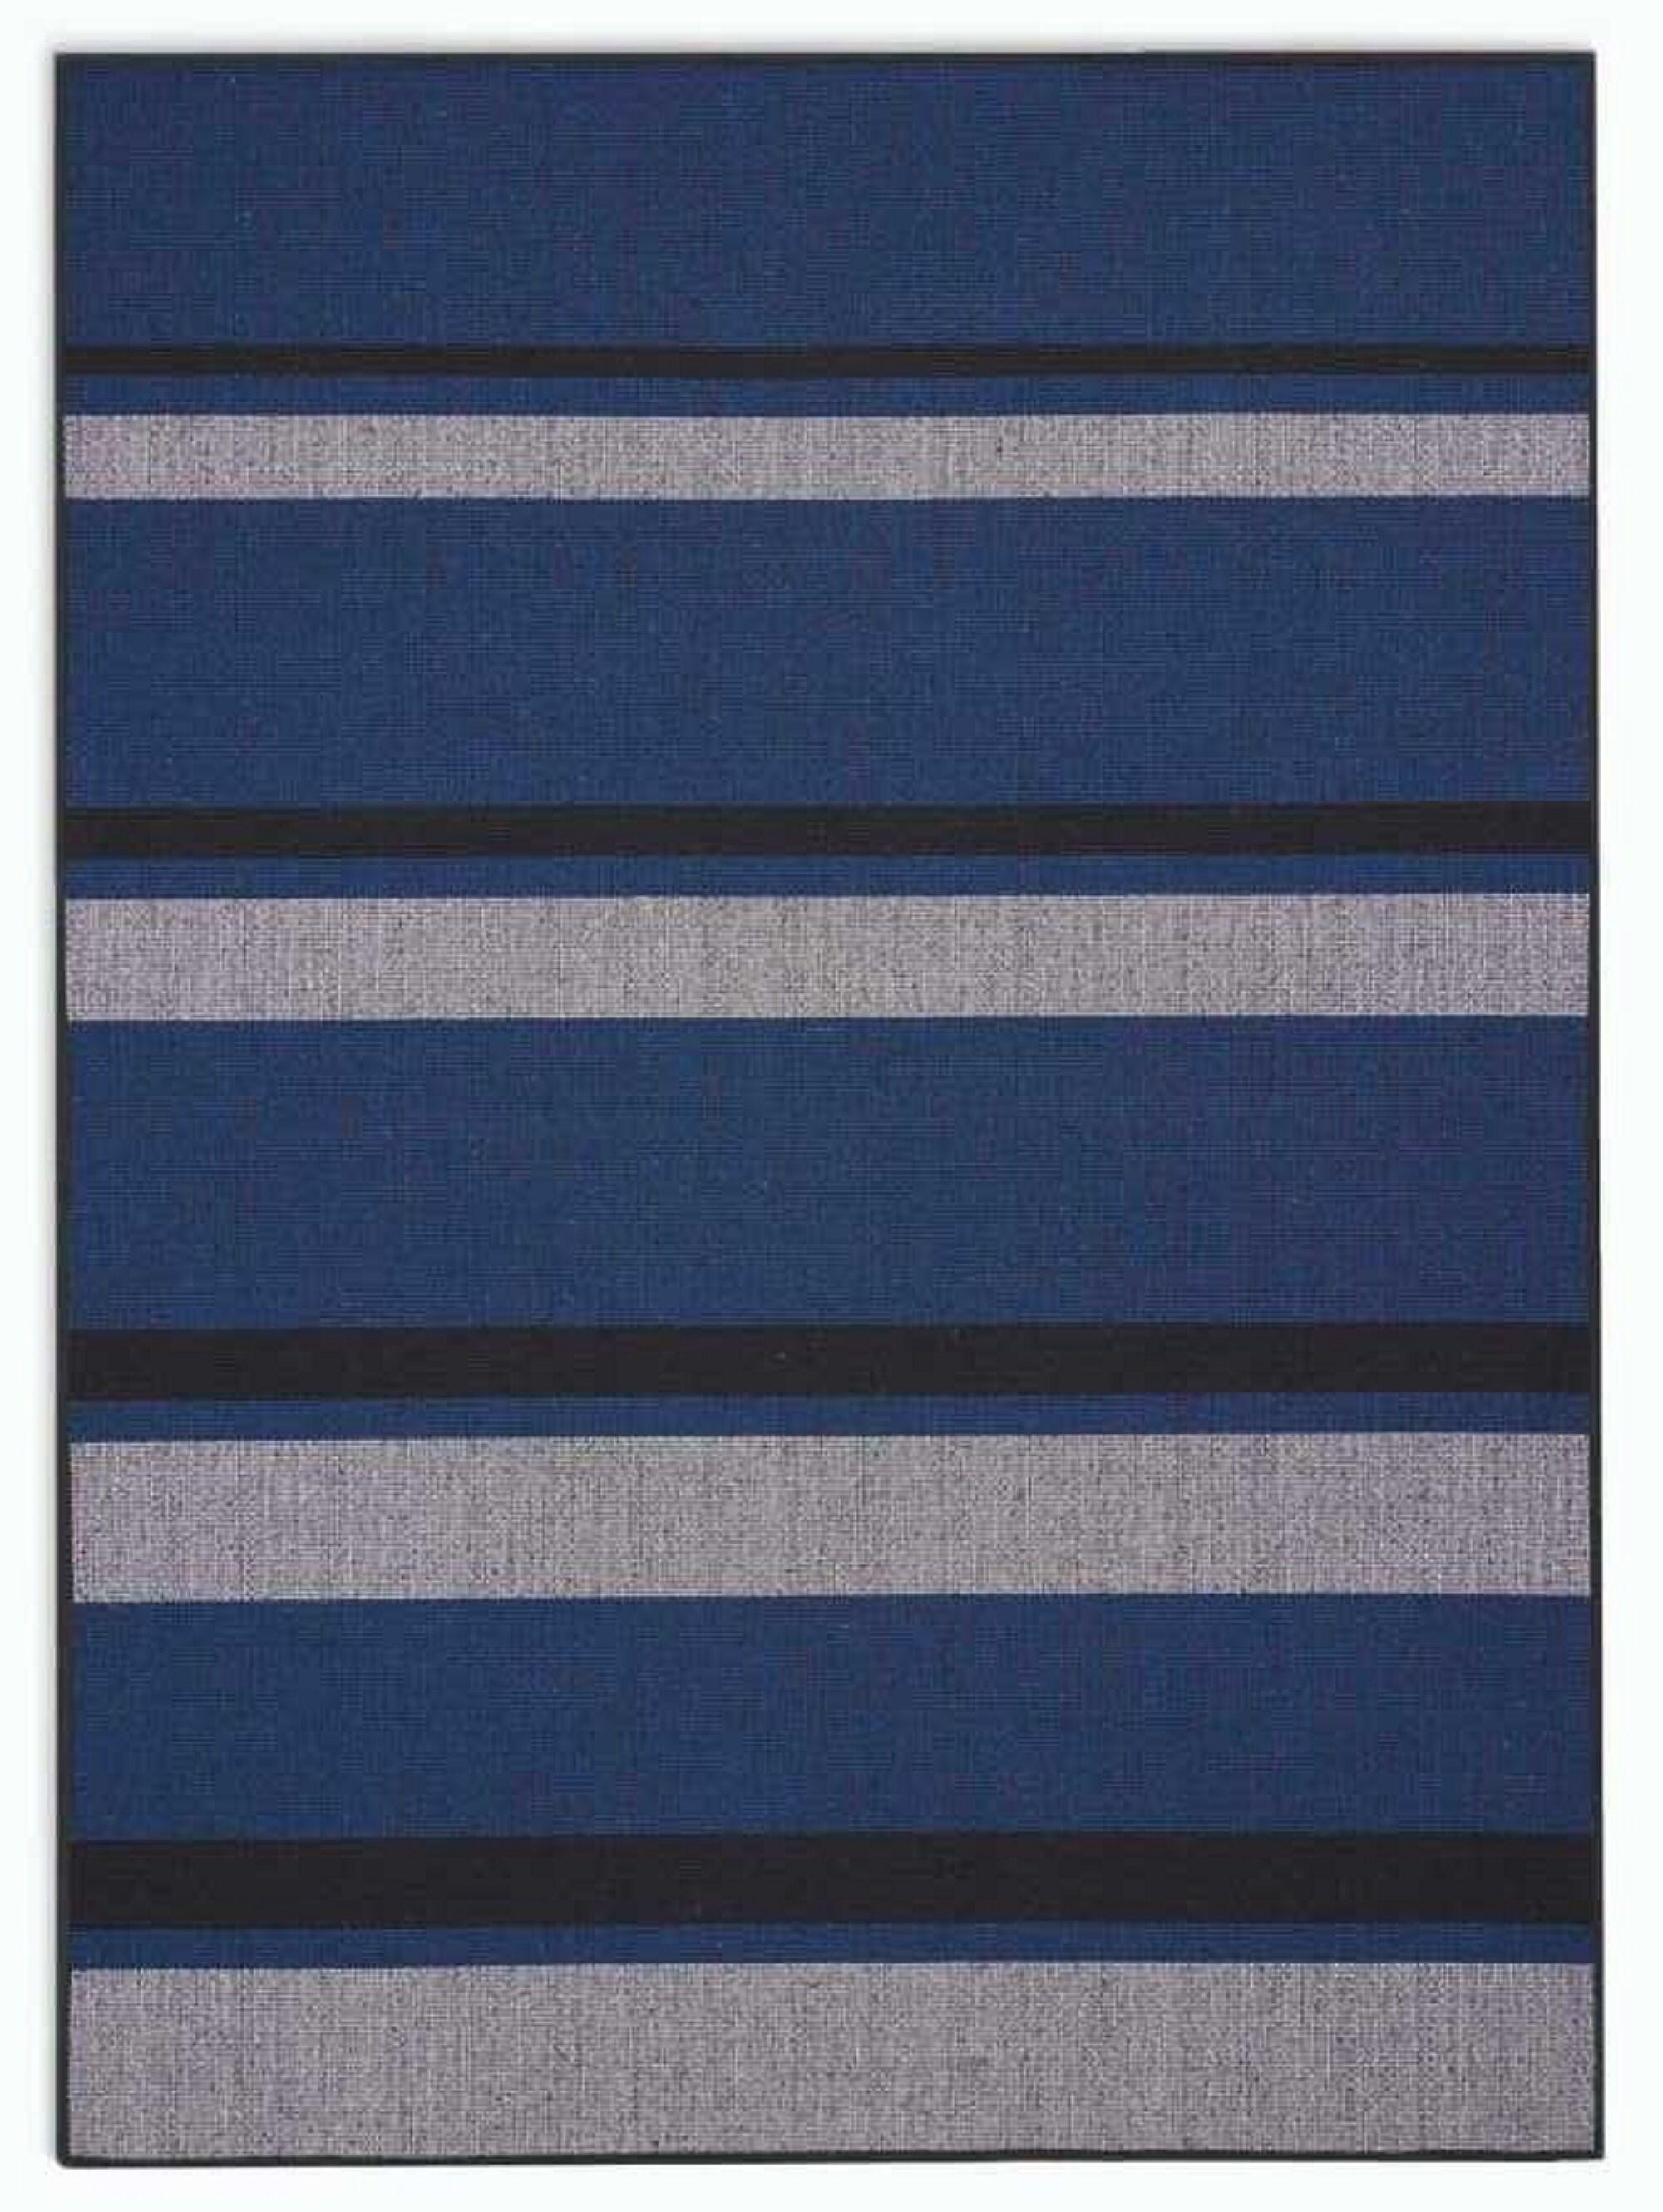 San Diego CK730 Striped Hand-woven Flatweave Cobalt Blue/Black Area Rug Rug Size: Rectangle 4' x 6'